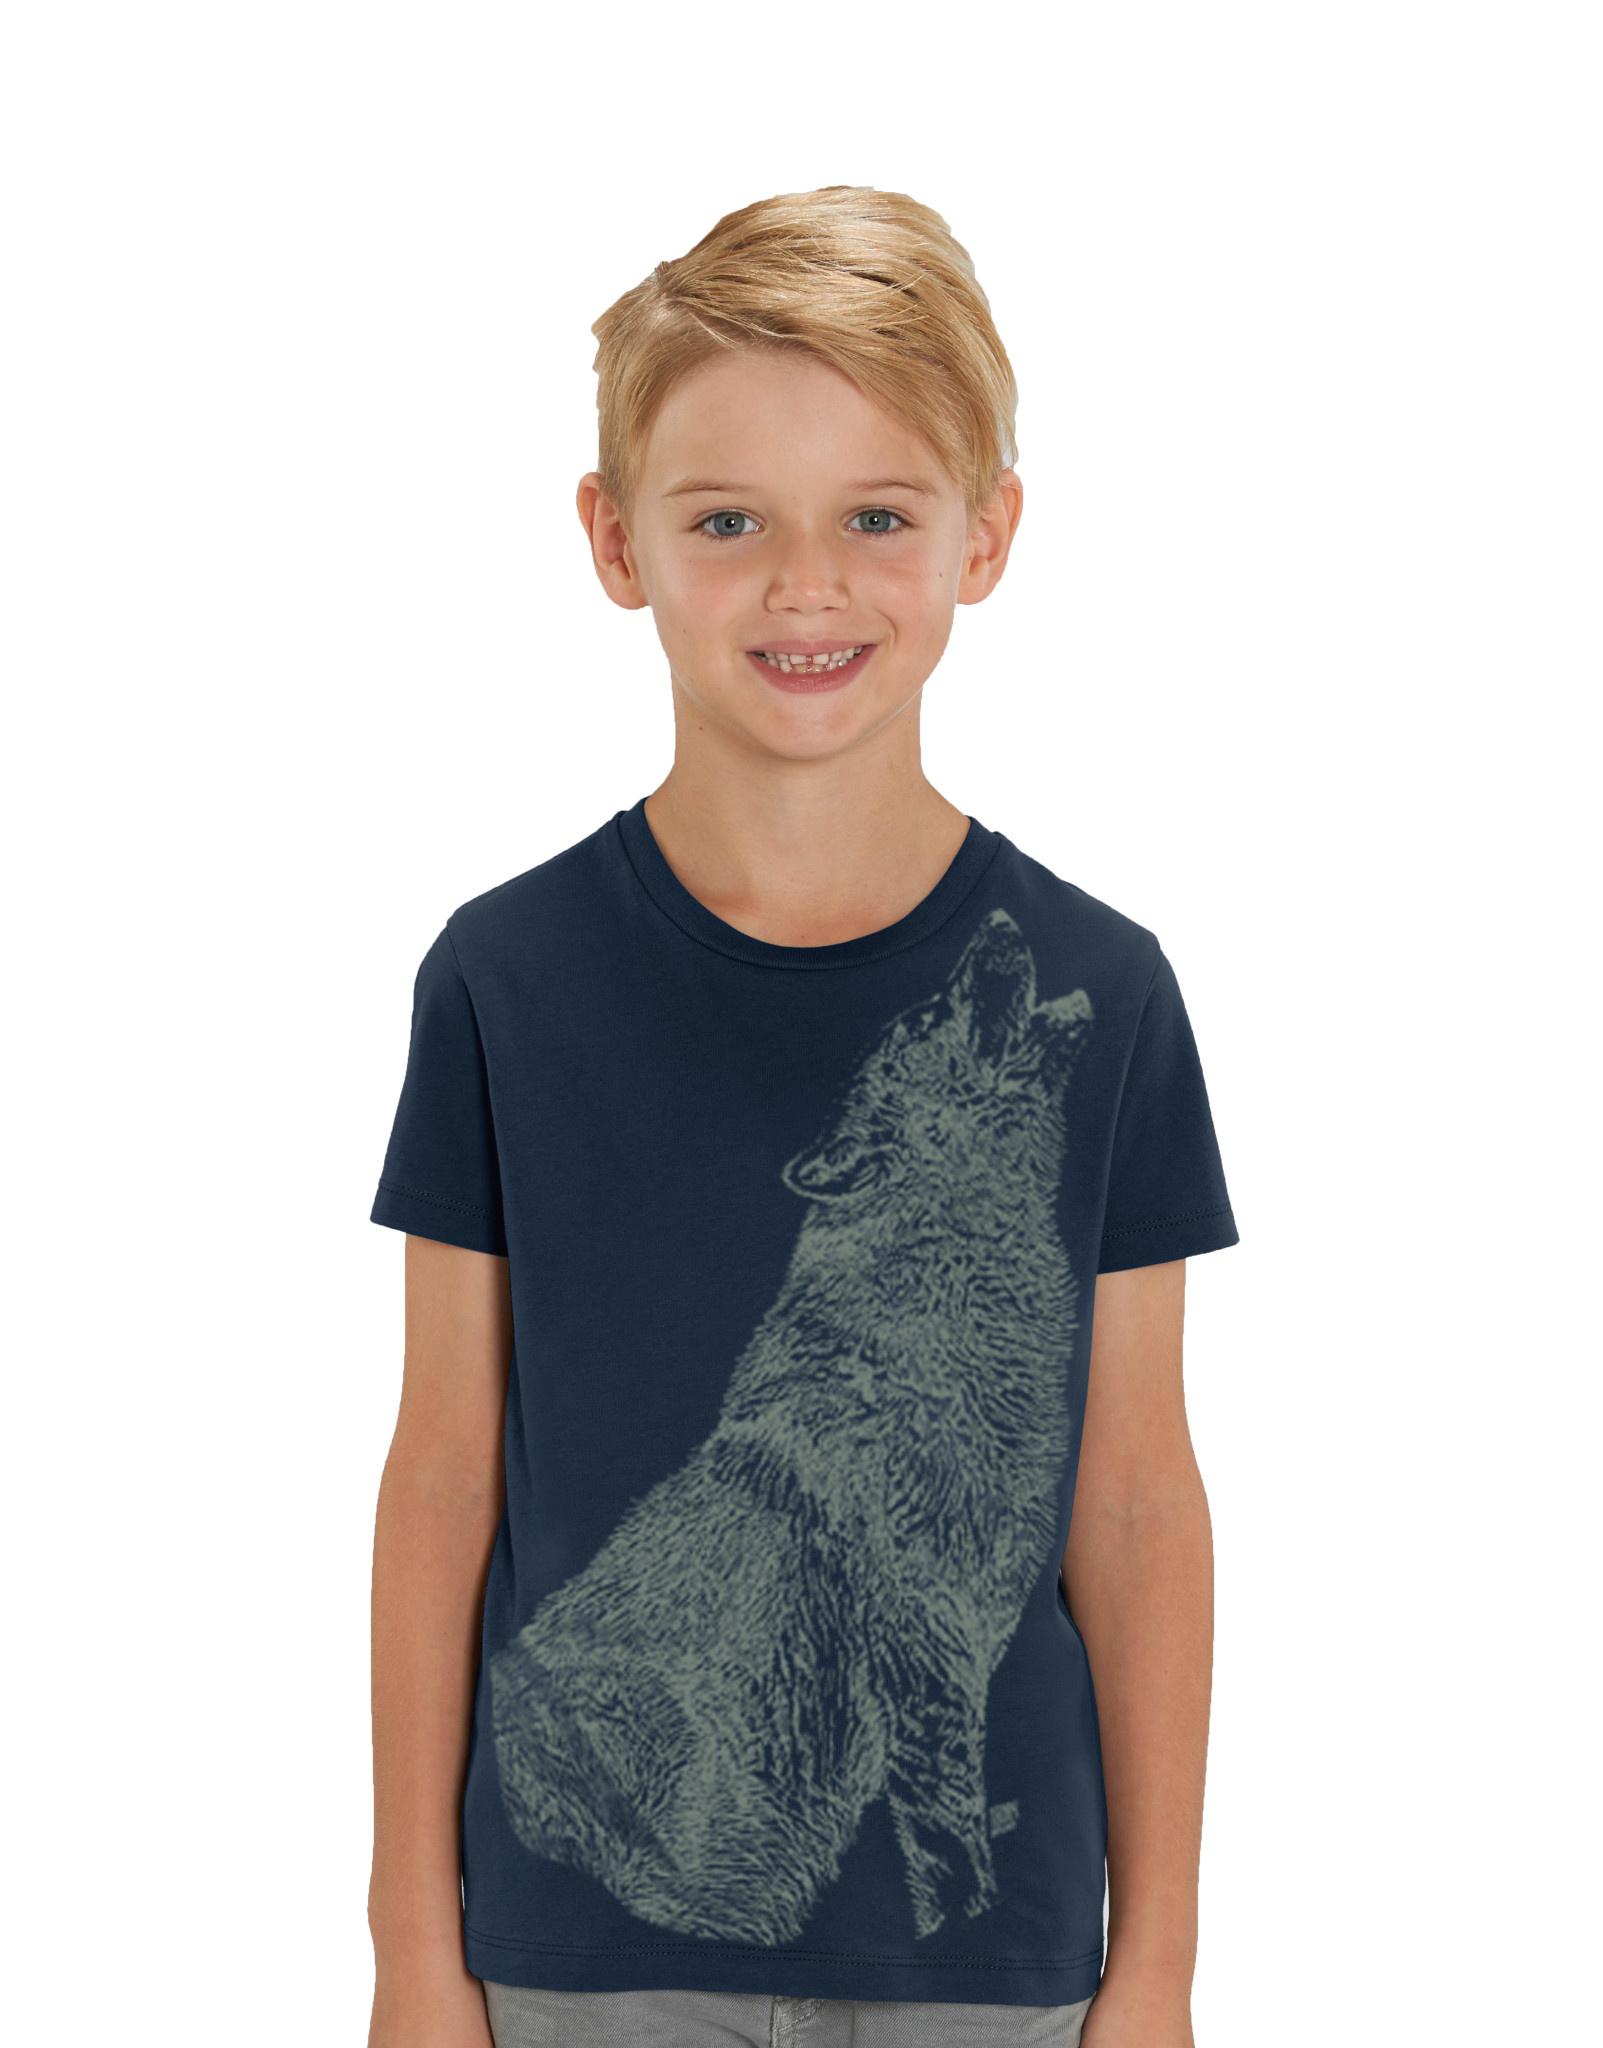 Huilende Wolf T-shirt - Glow In the Dark